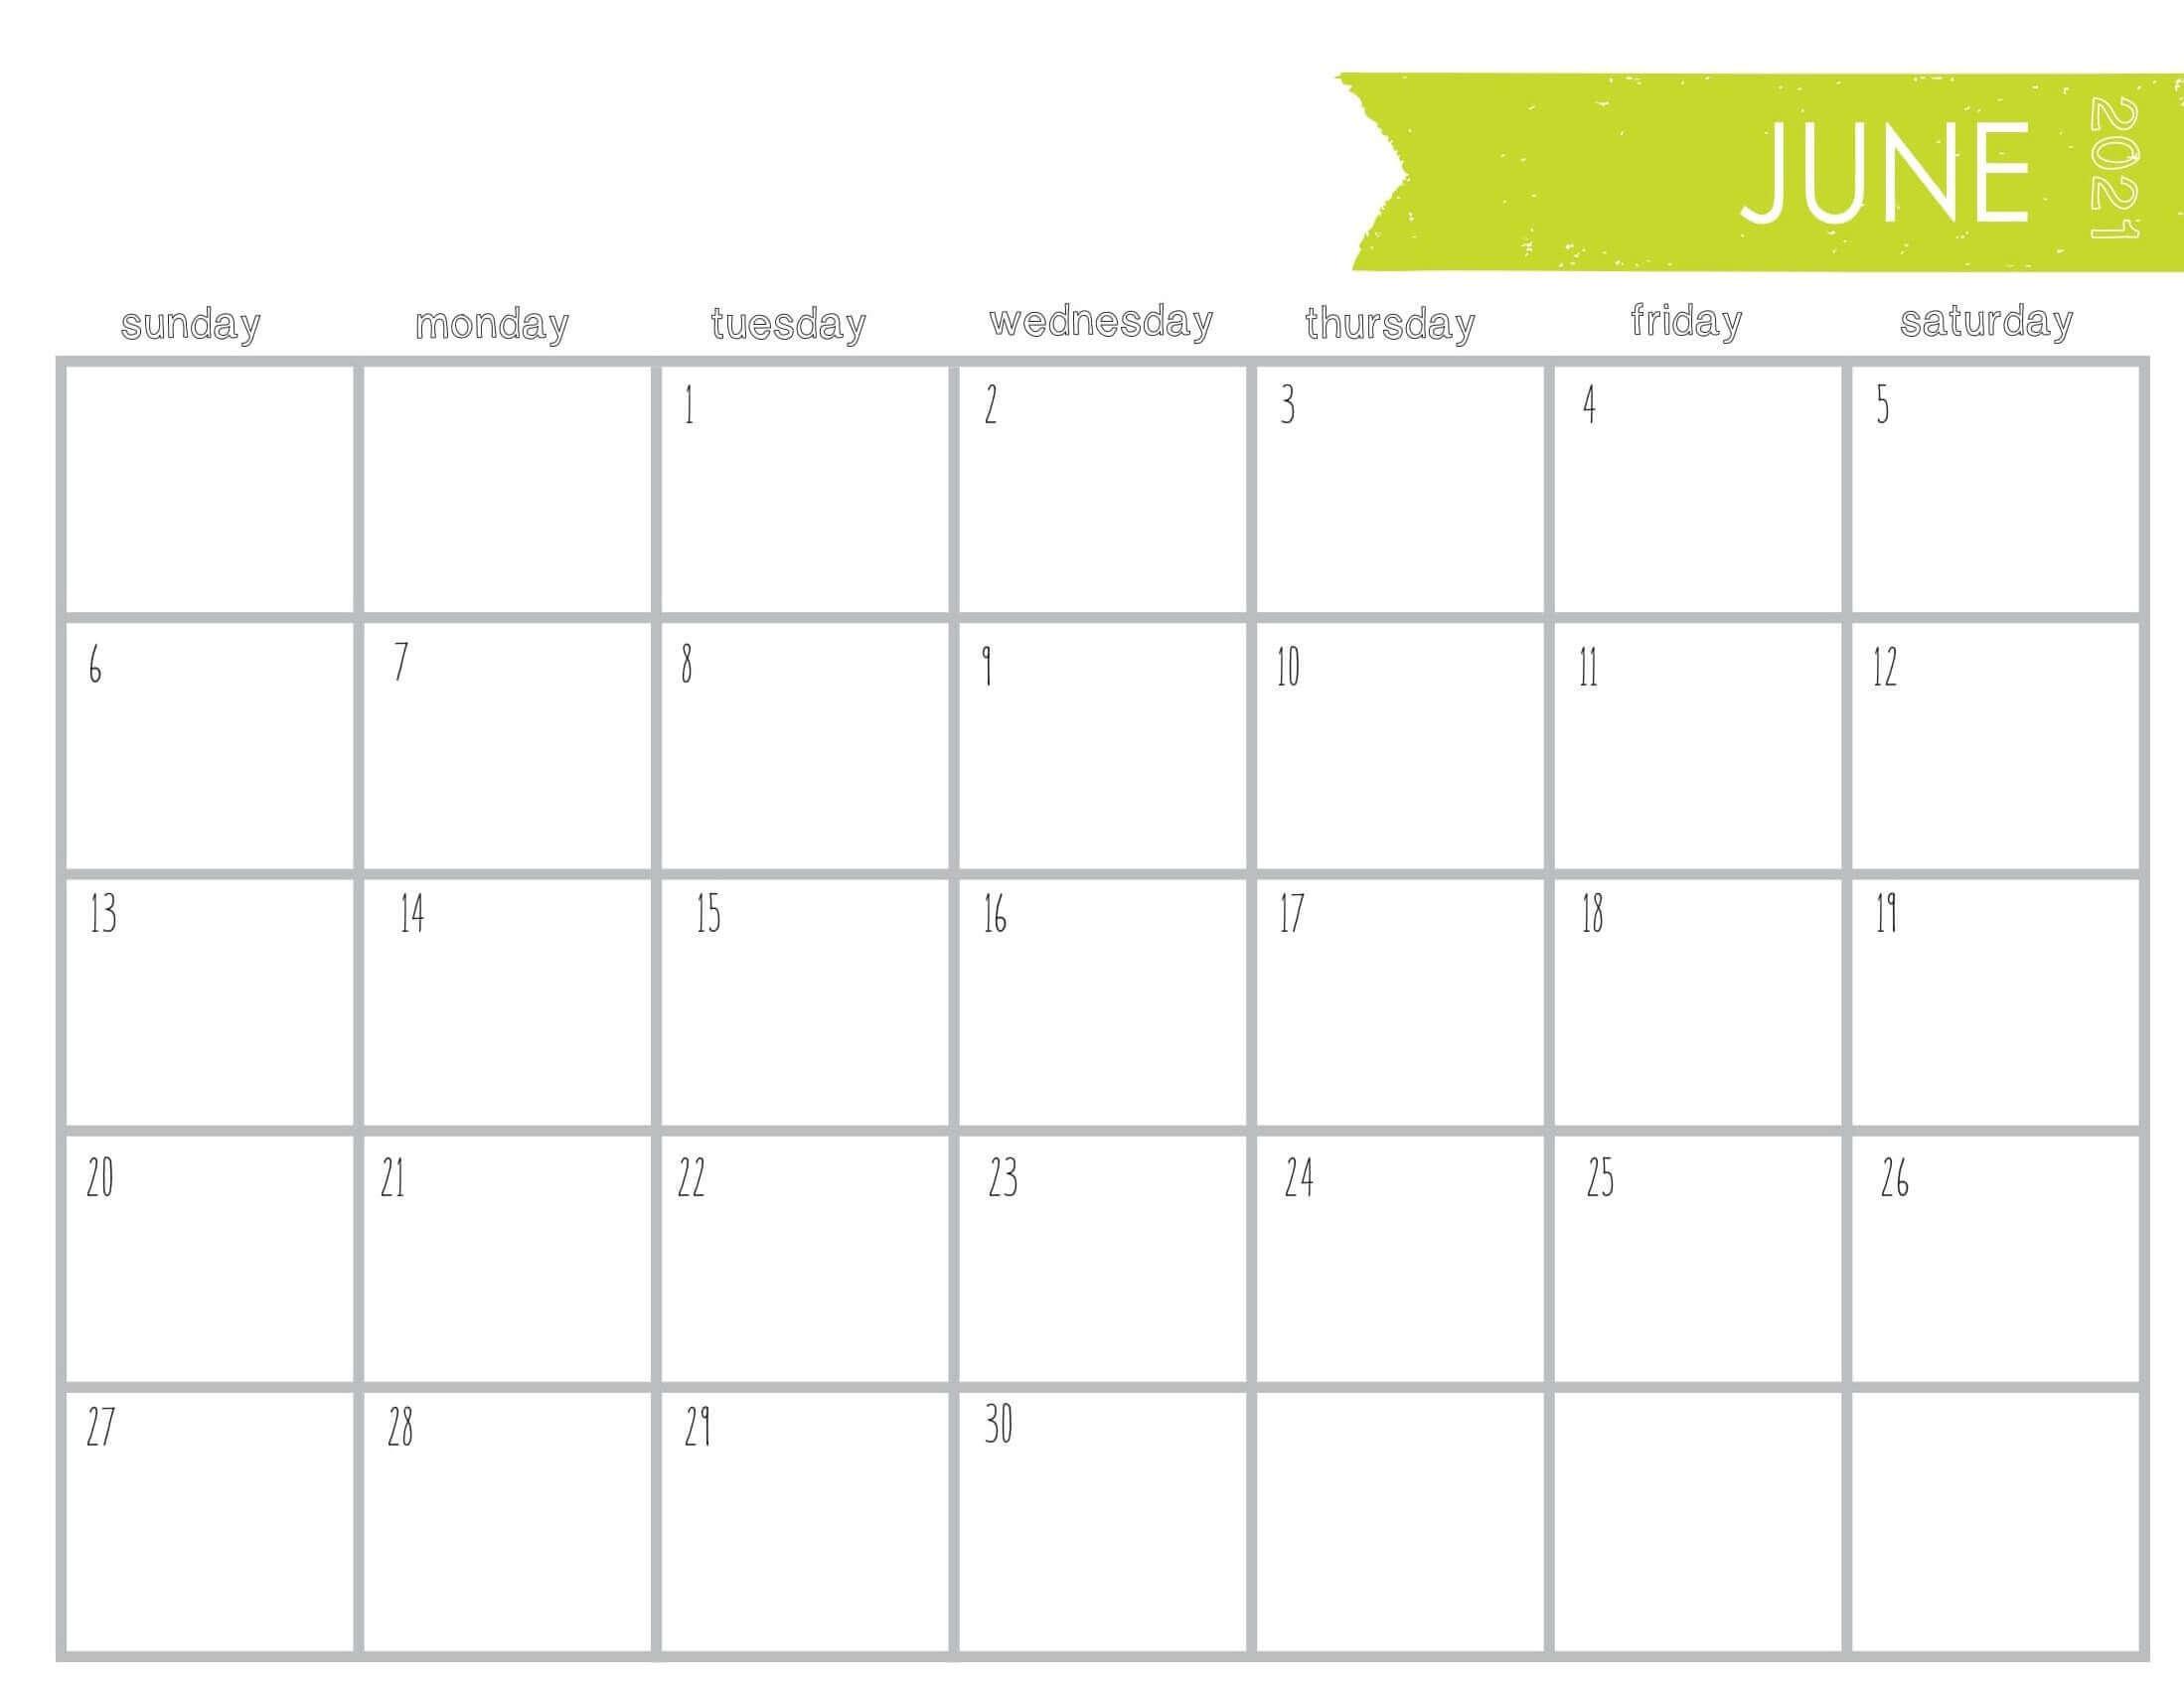 Print June Calendar 2021